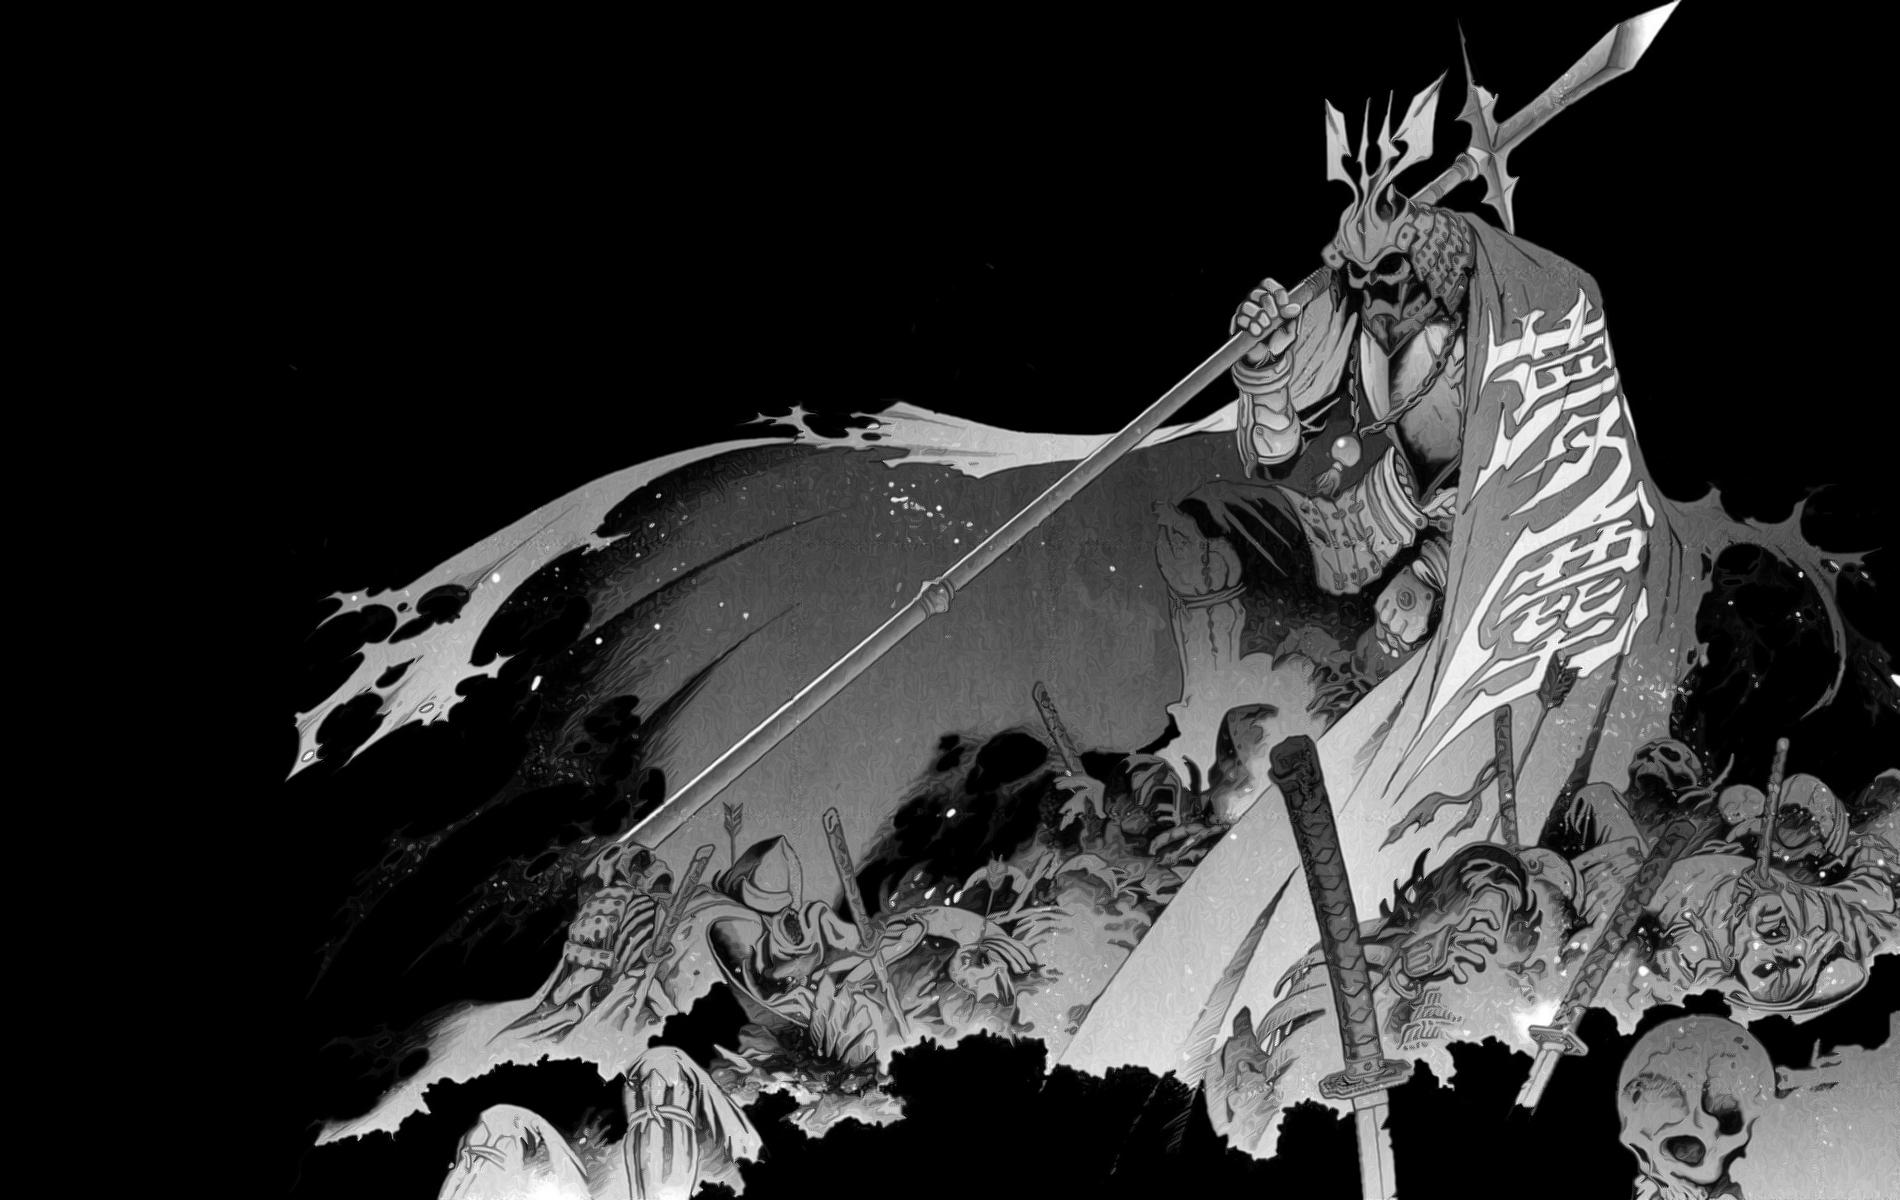 Drawn samurai desktop background Wallpapers visitar Lugares samurai samurai